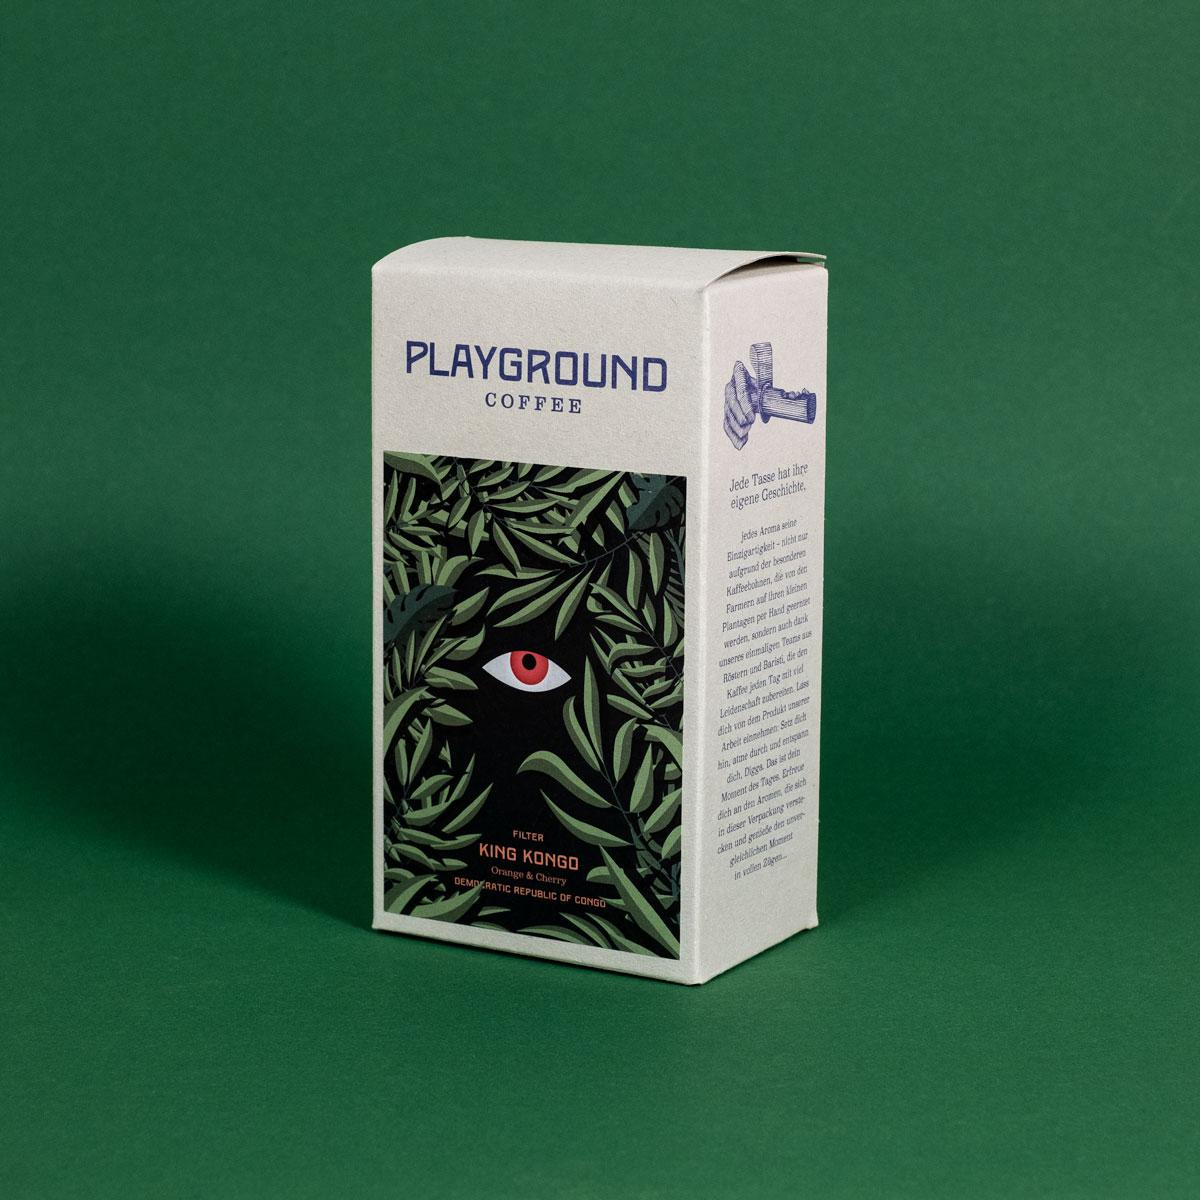 kingkongo